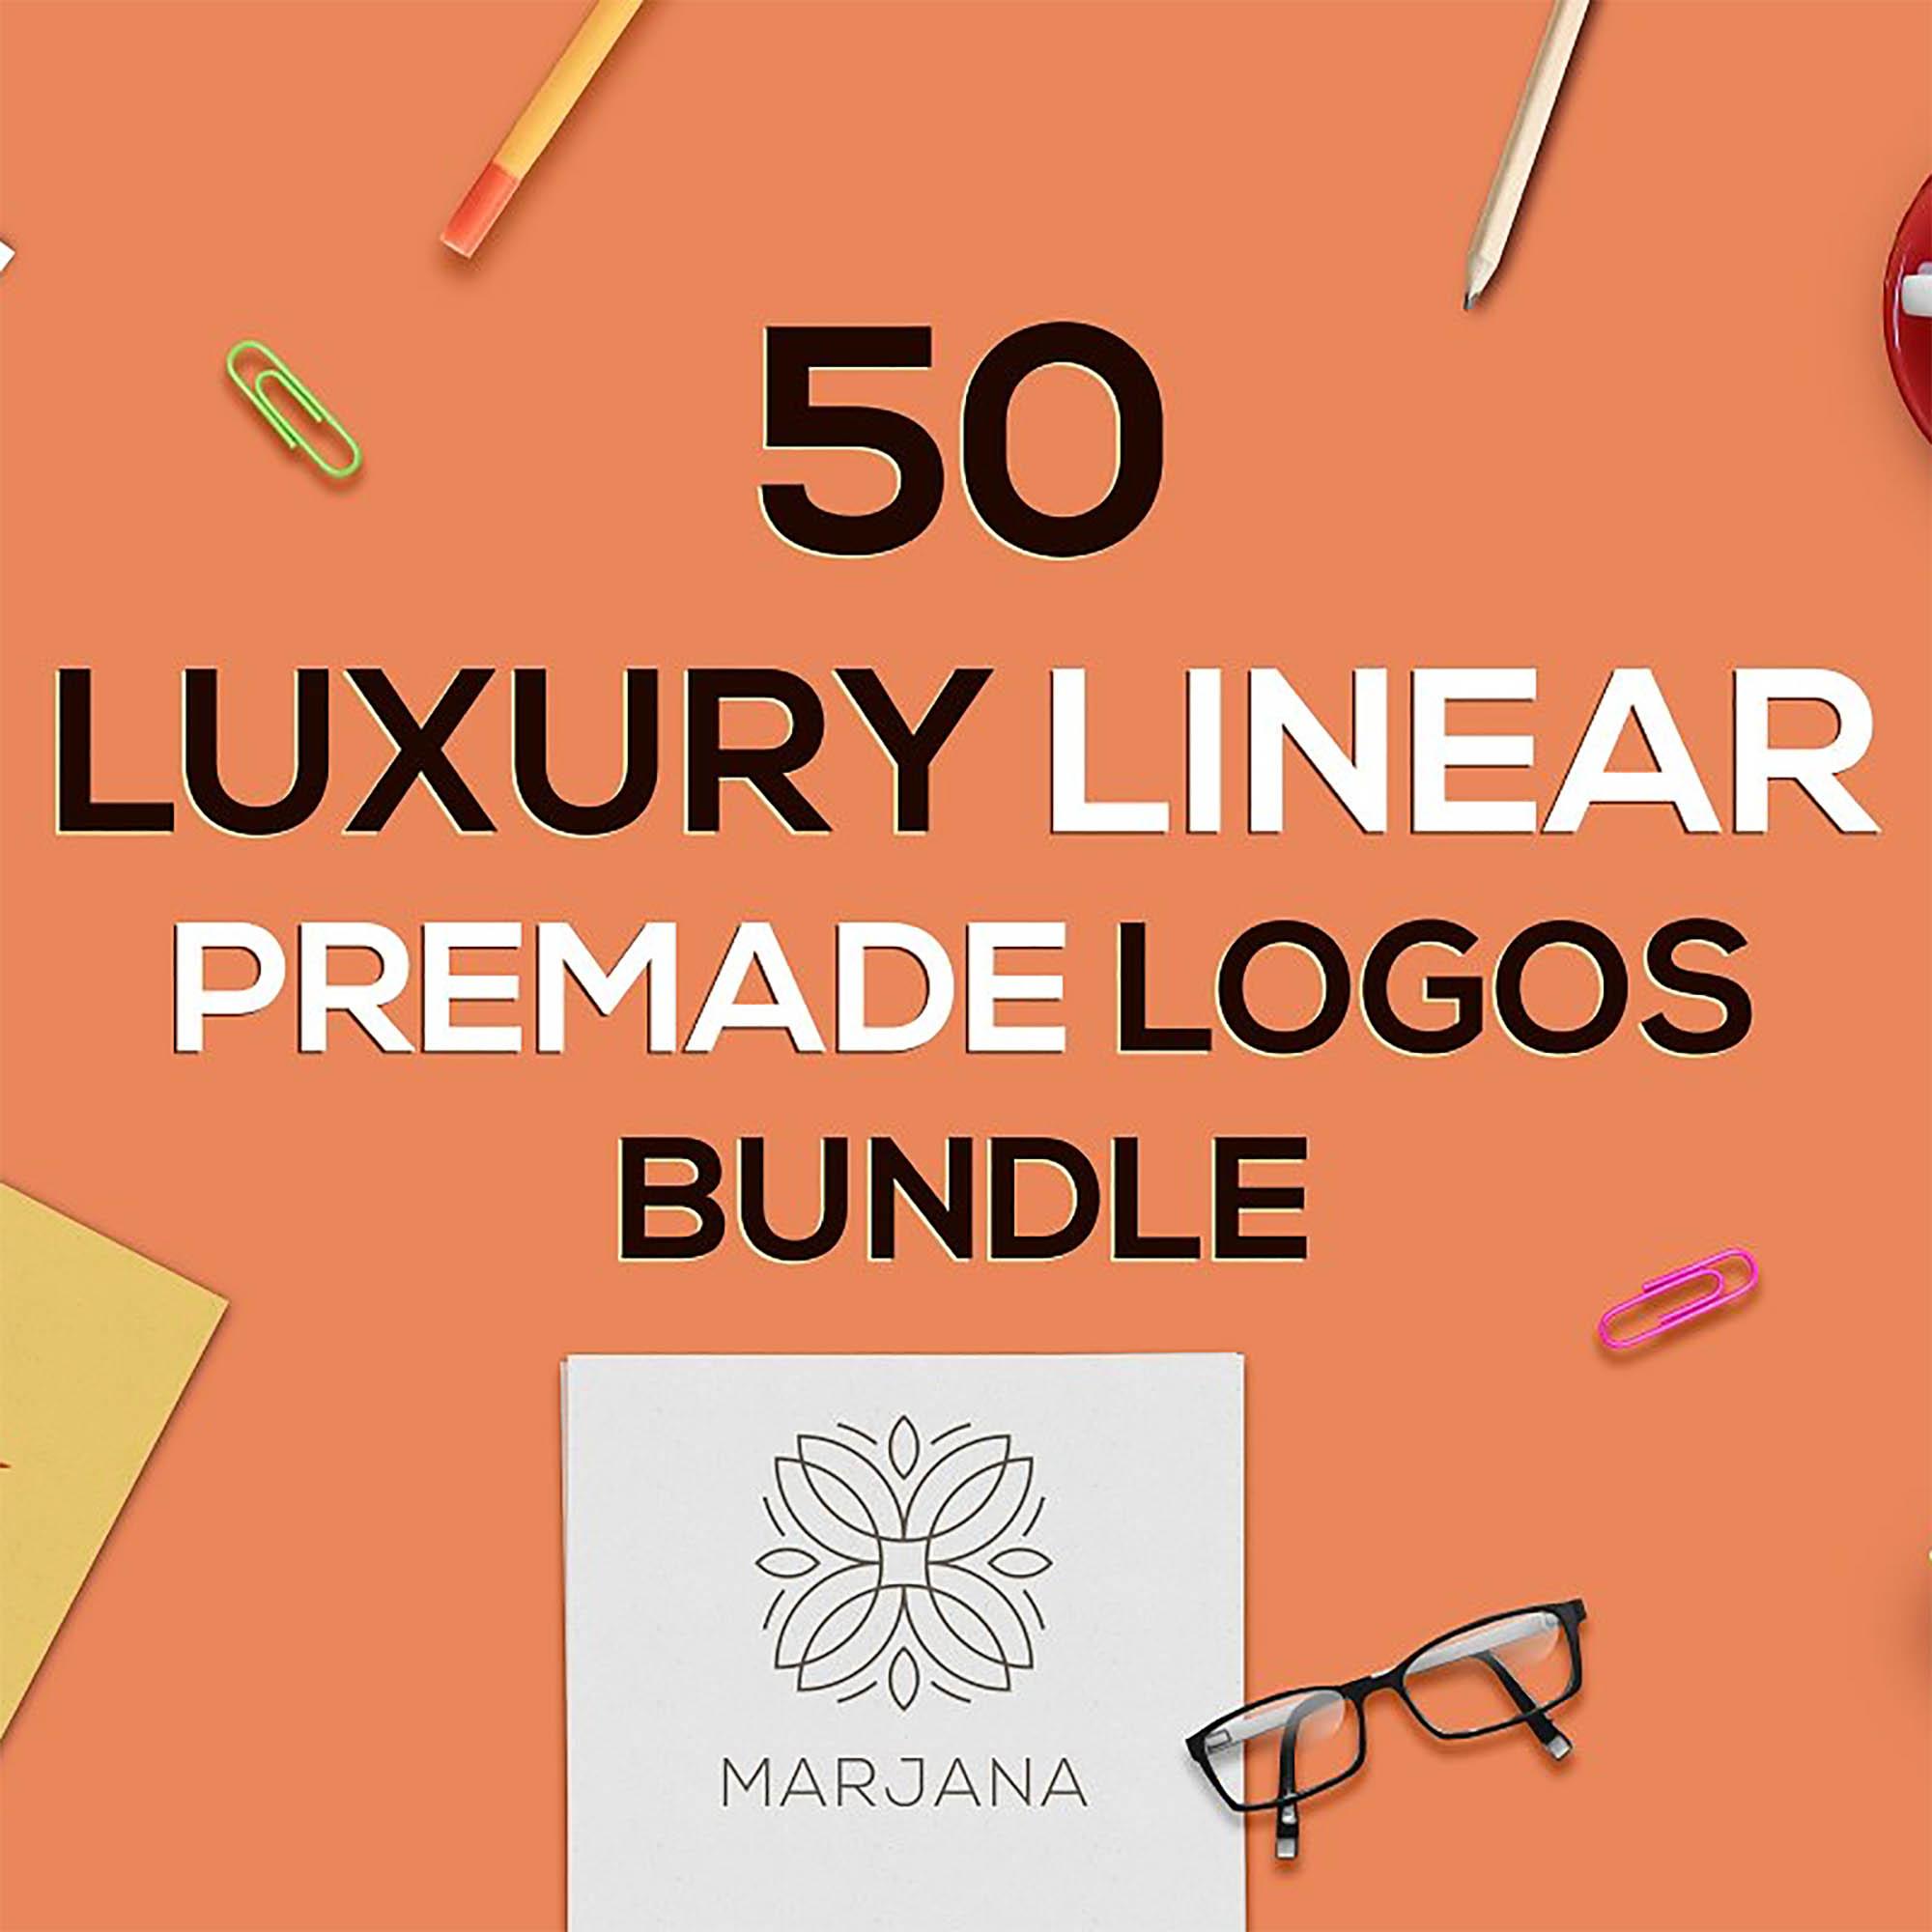 Luxury Logo Bundle main cover.